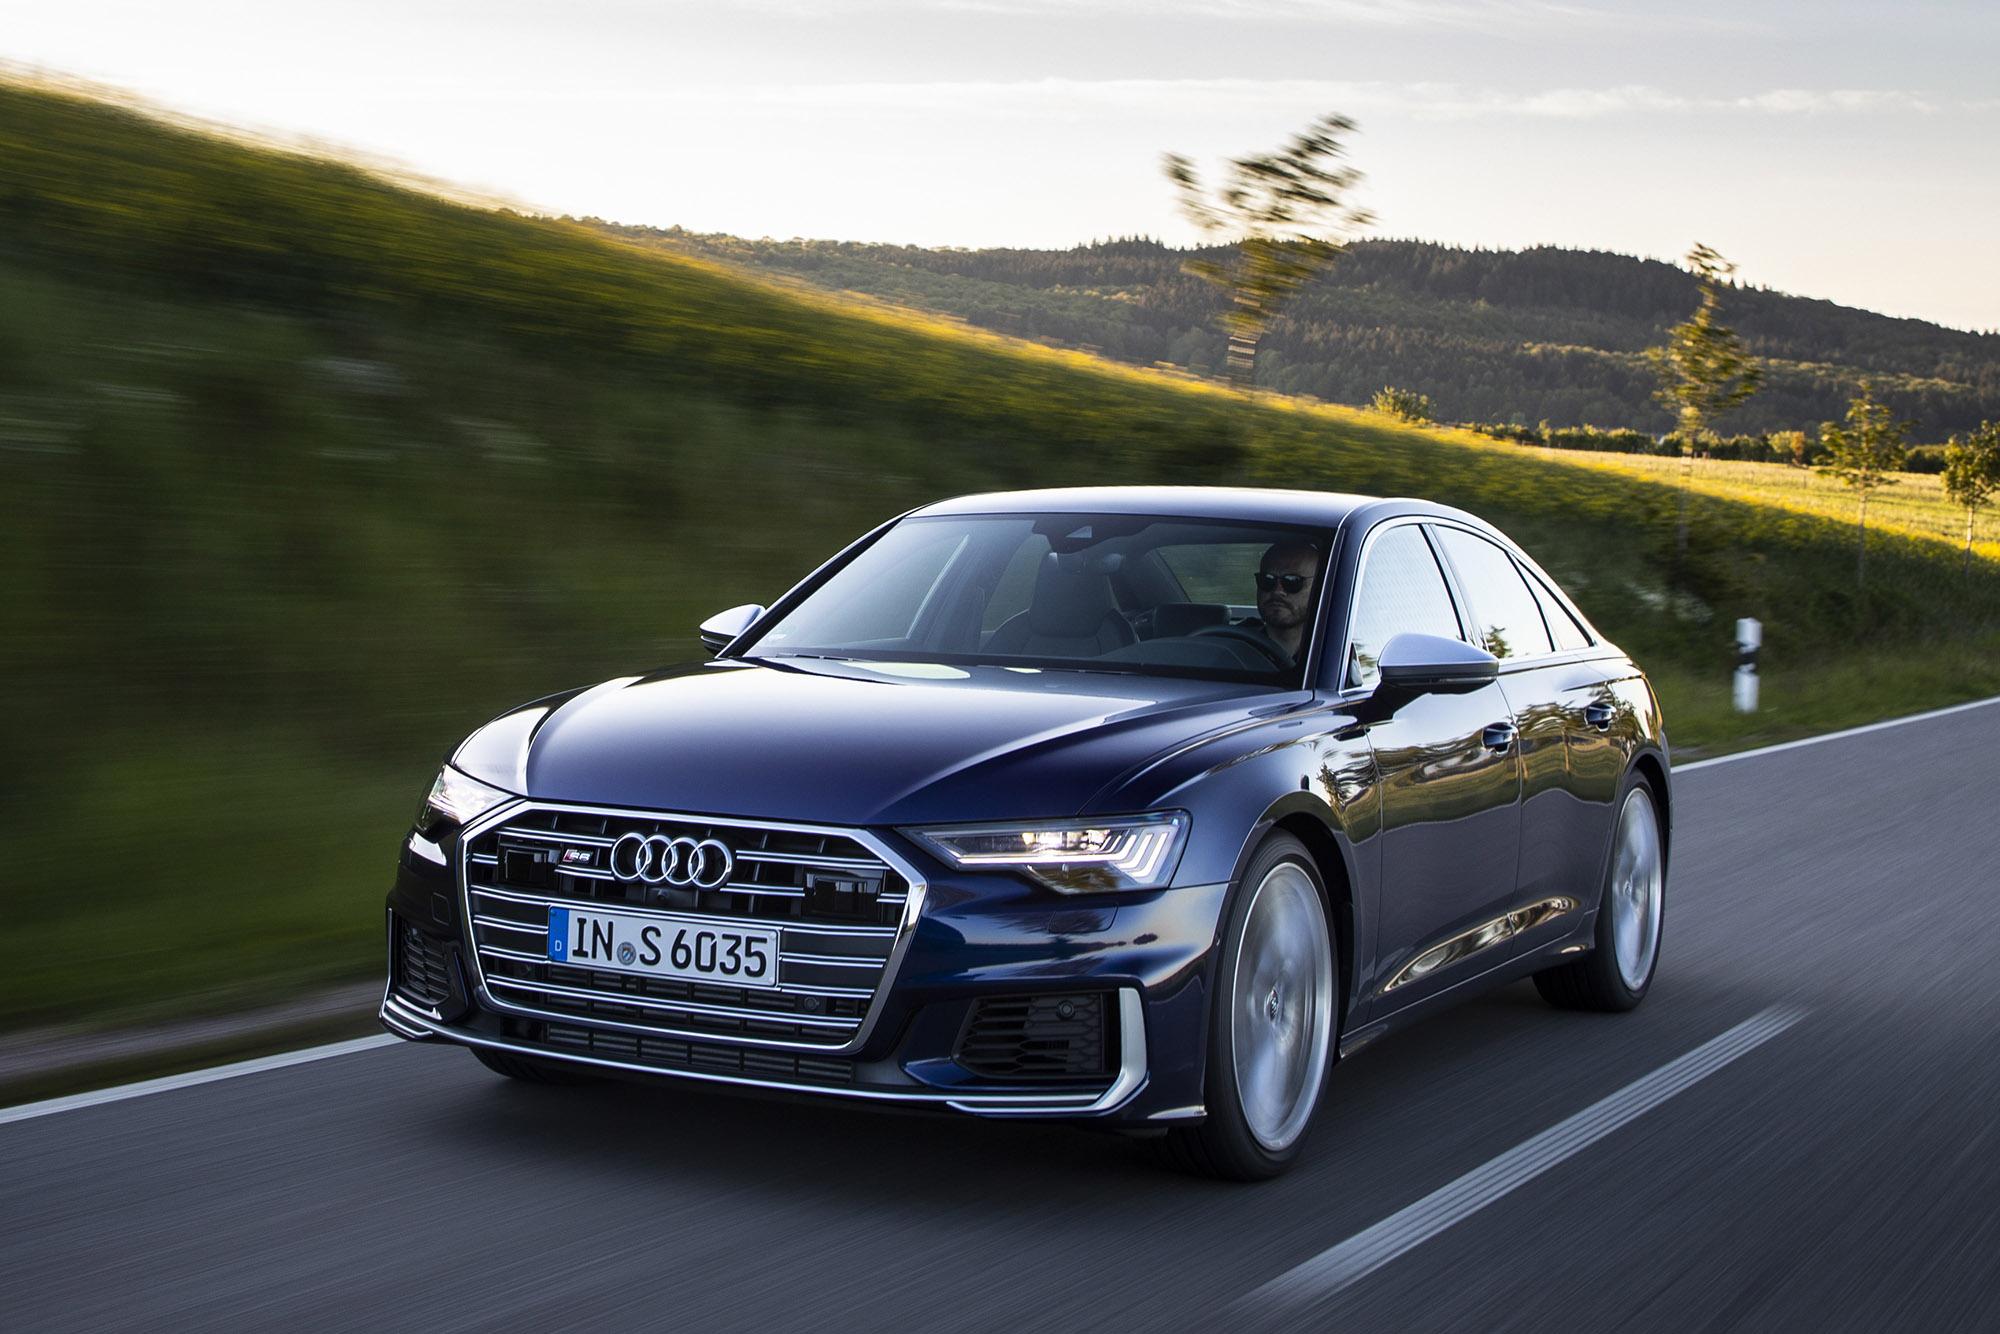 2019 Audi Q6: Design, Mileage, Release, Price >> 2020 Audi S6 Returns To Spice Up A6 Sedan Lineup News